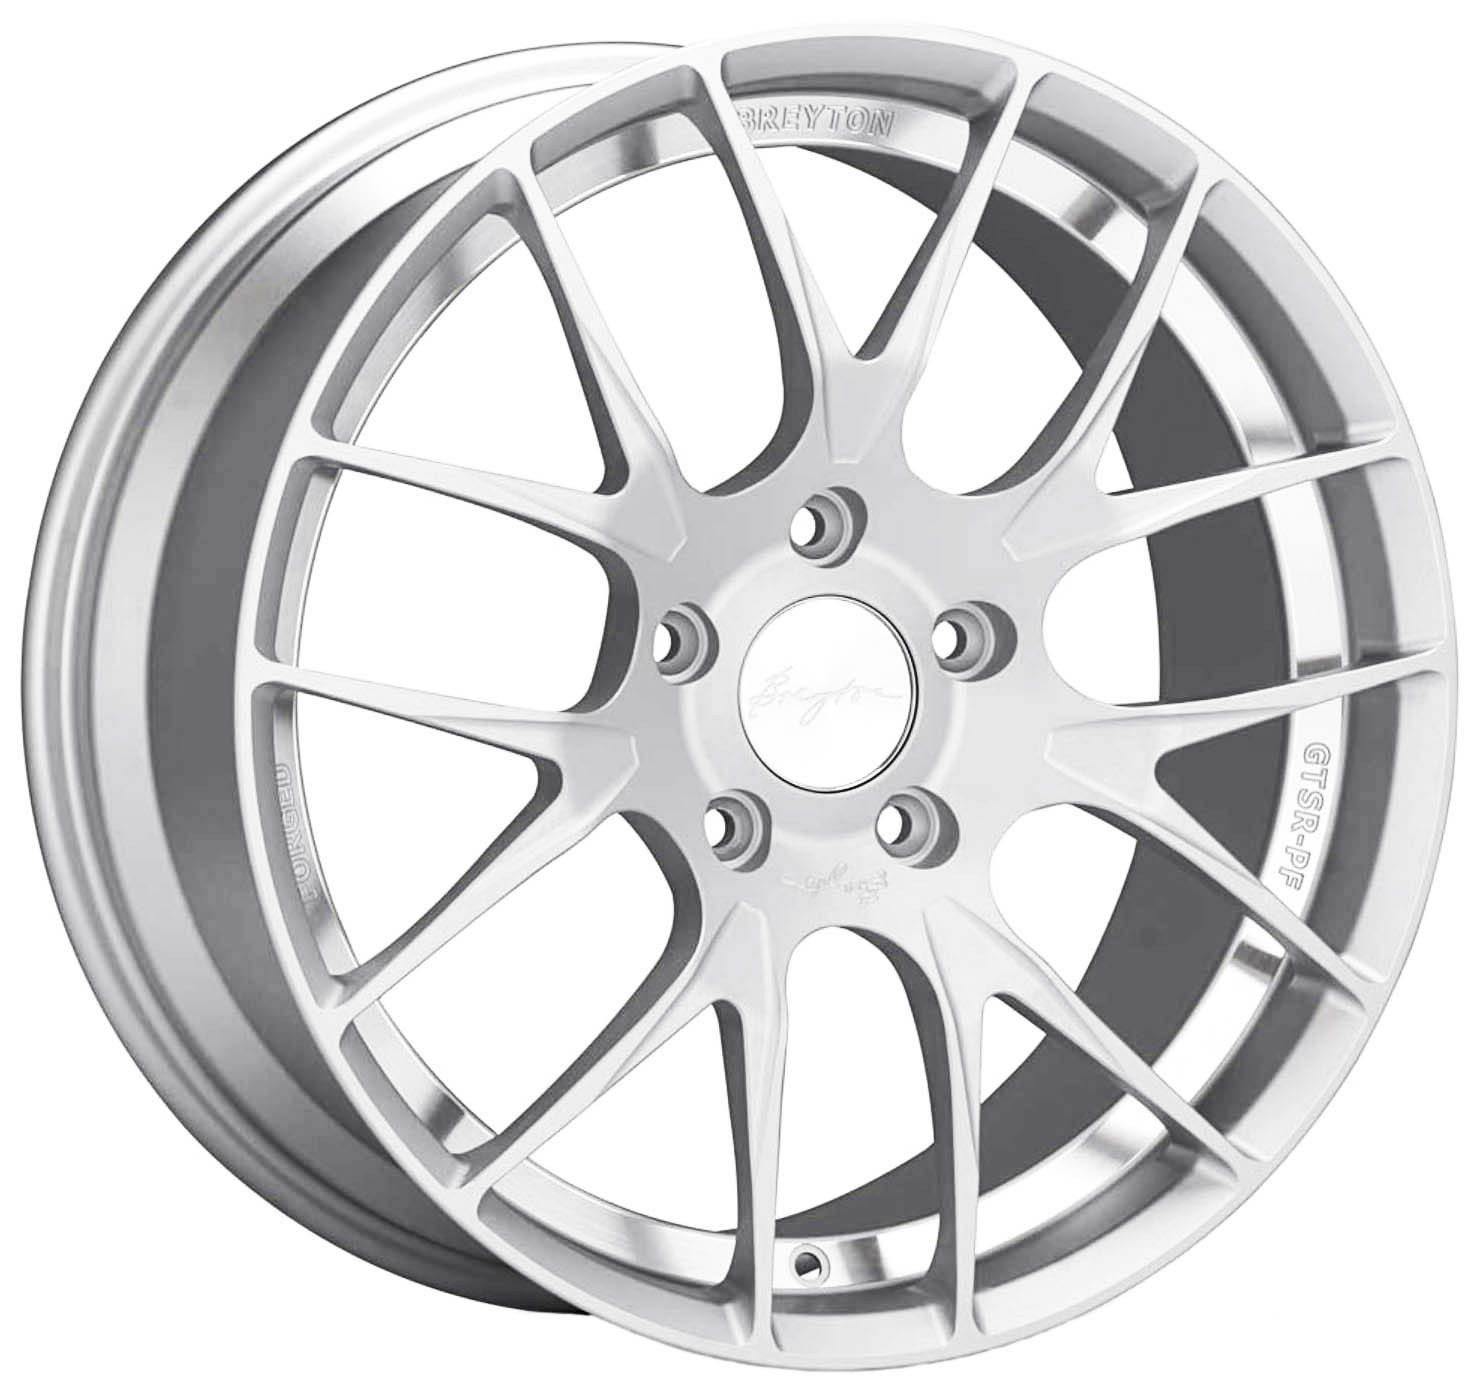 Breyton - GTSR-PF (Silver Anodised)